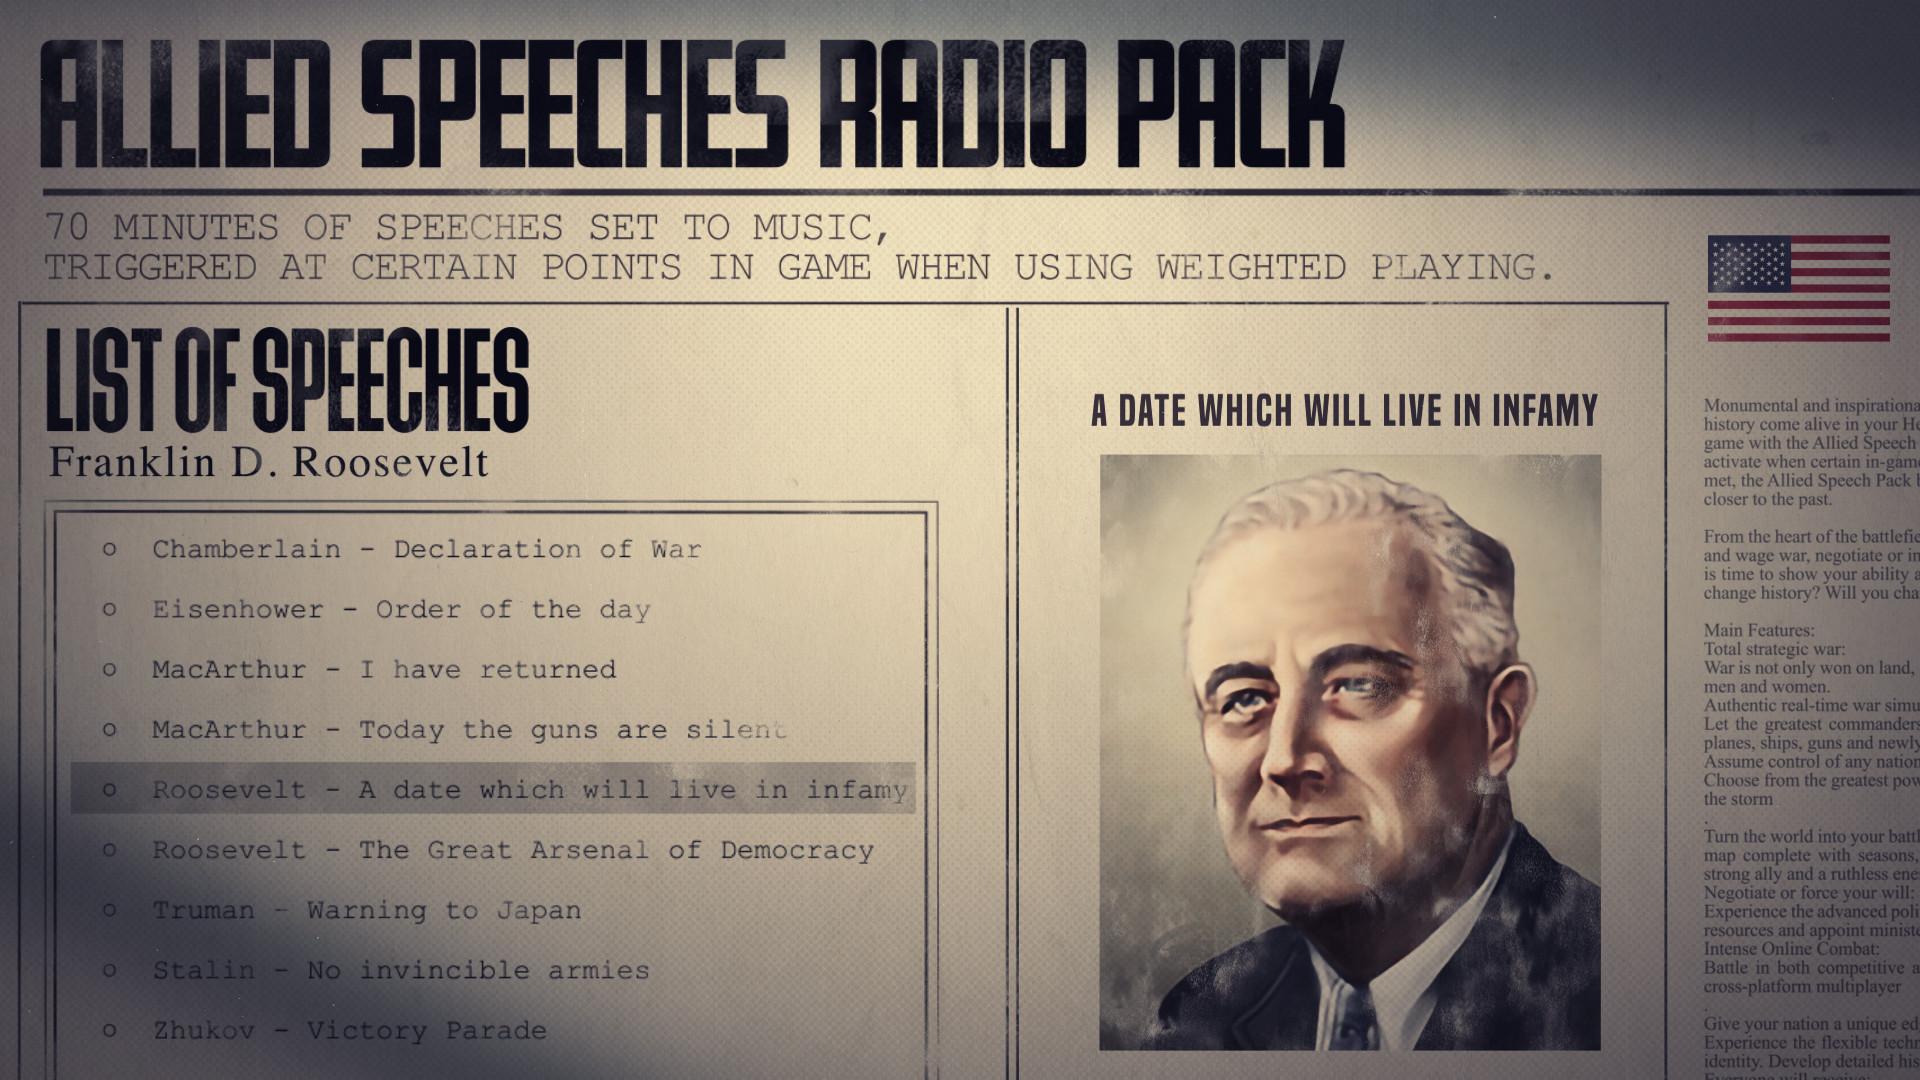 Hearts of Iron IV: Allied Speeches Music Pack Fiyat Karşılaştırma